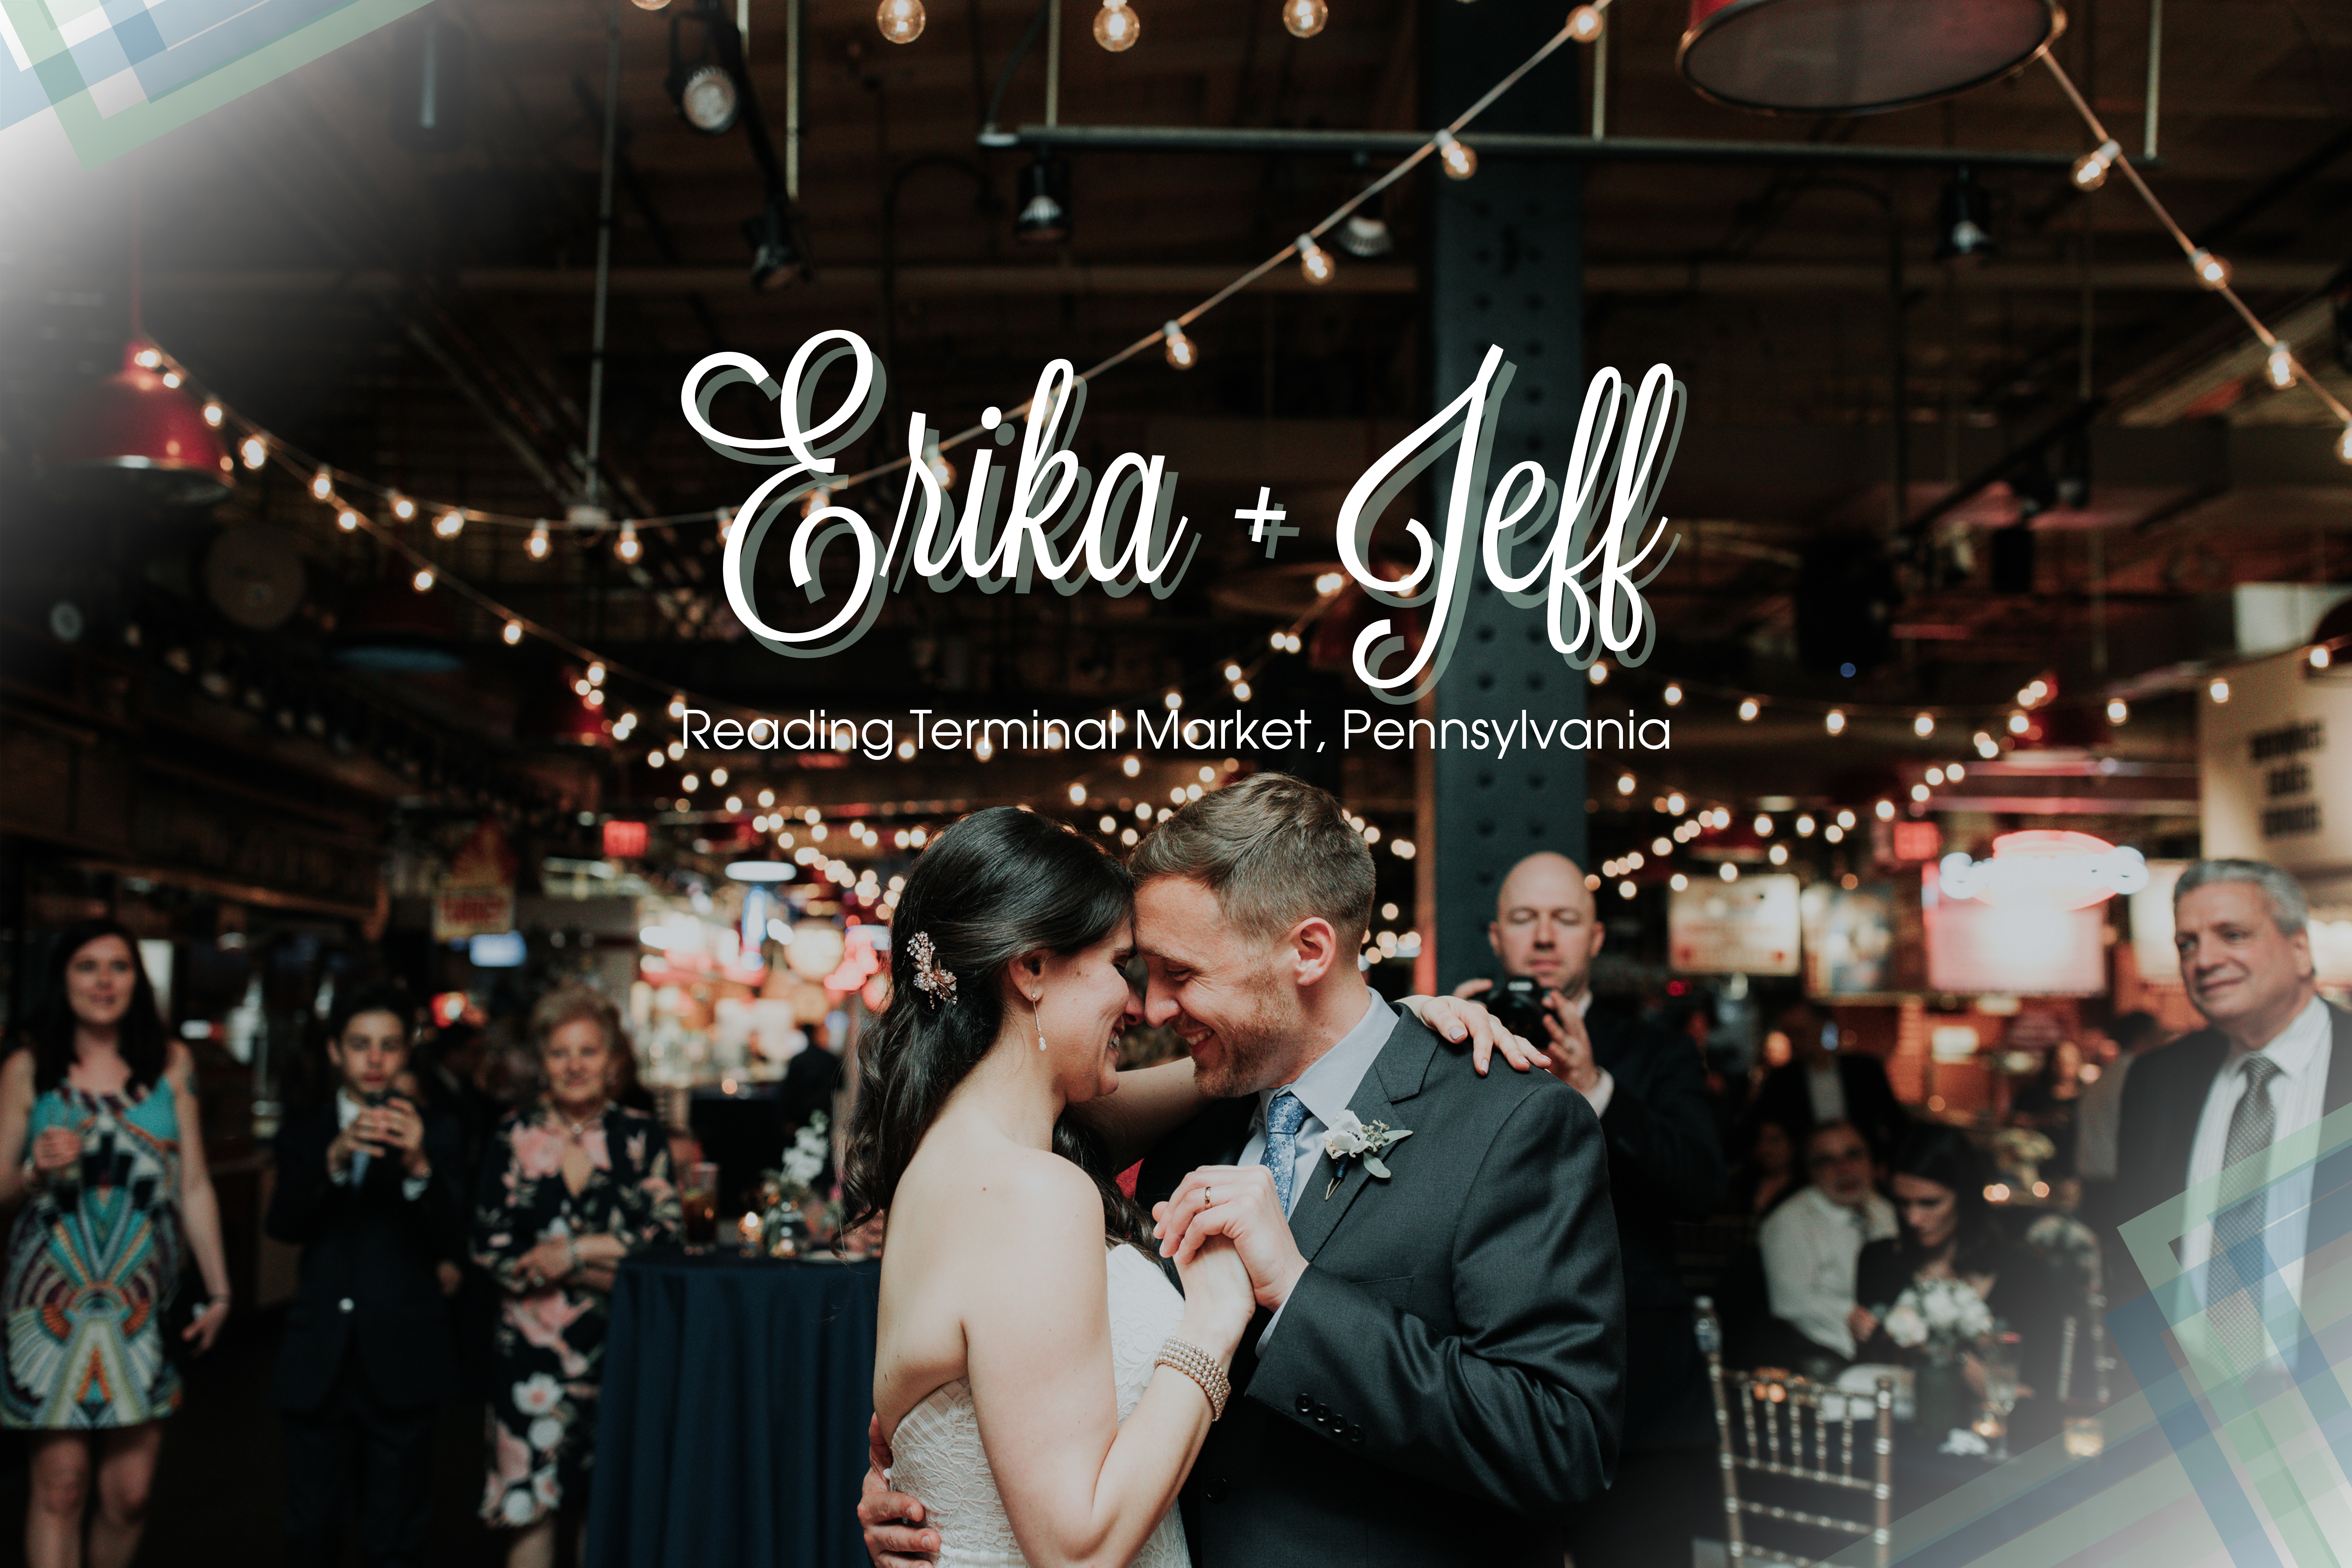 Erika Jeff Wedding In Reading Terminal Market Pa Lily Szabo